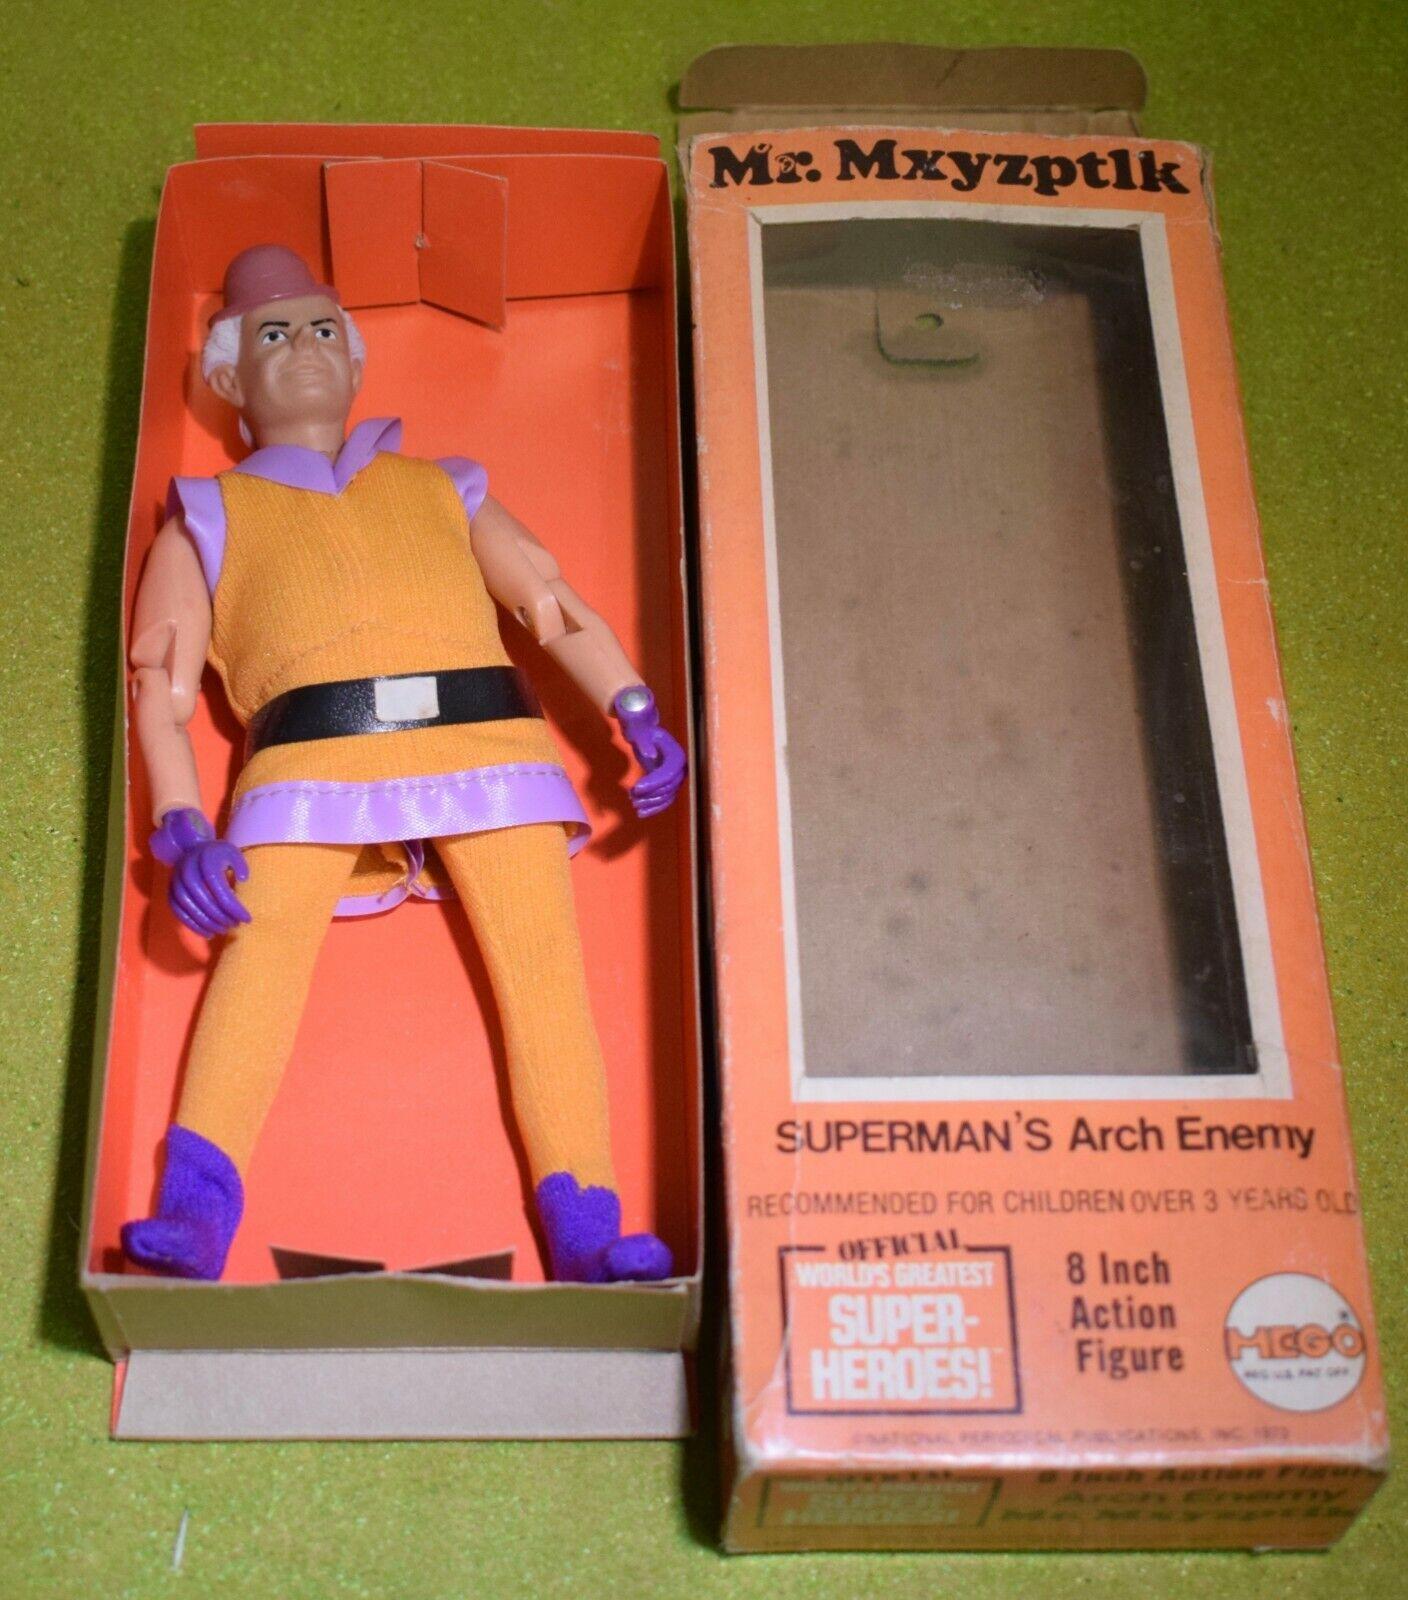 MEGO SUPER-HEROES MR MXYZPTLK SUPERMANS ARCH ENEMY 8 INCH FIGURE AS PICTURED